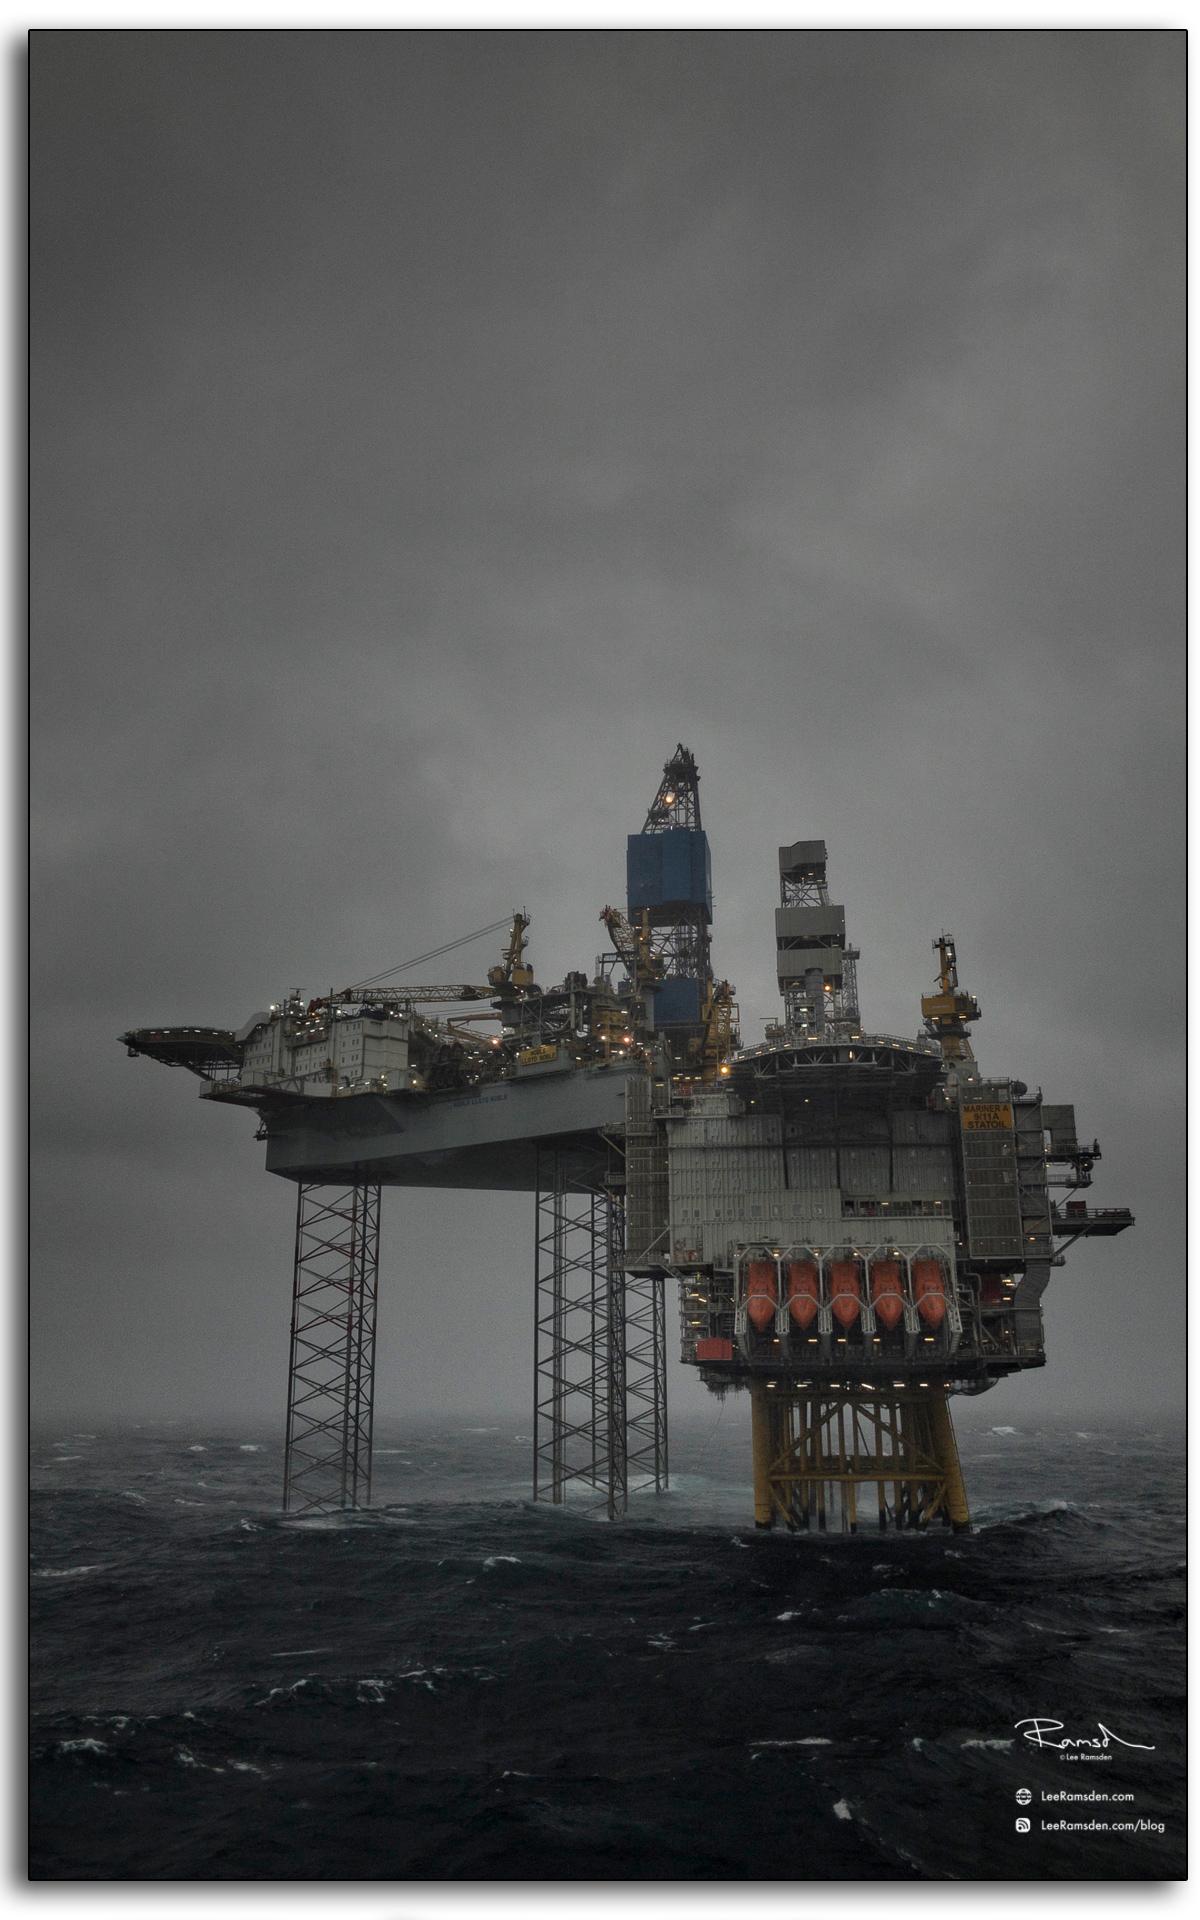 01 Marine, oil and gas, platform,  oil rig, equinor,  northsea.jpg